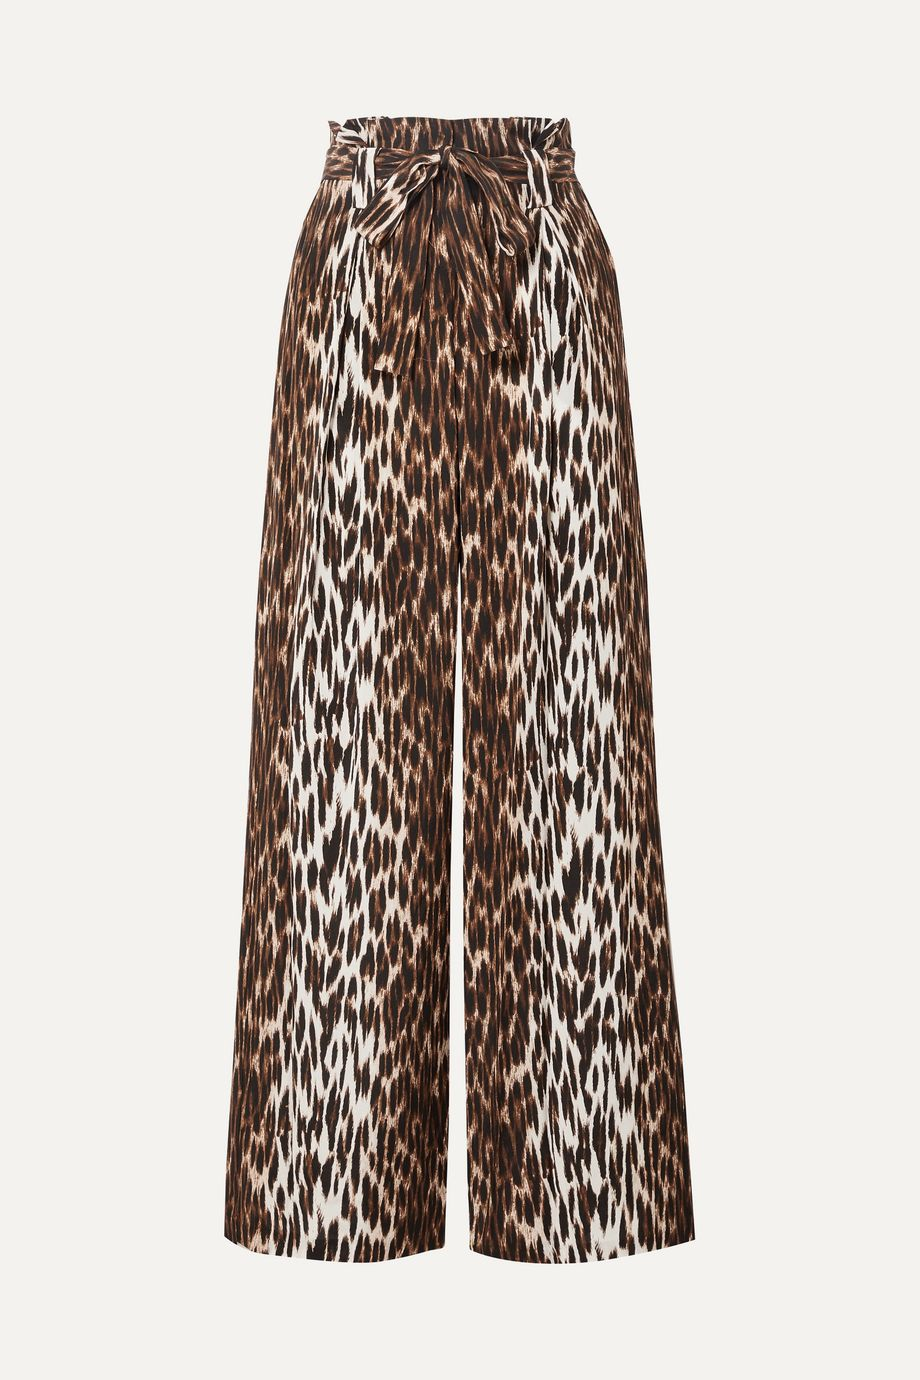 L'Agence Bobby belted leopard-print silk-crepe wide-leg pants